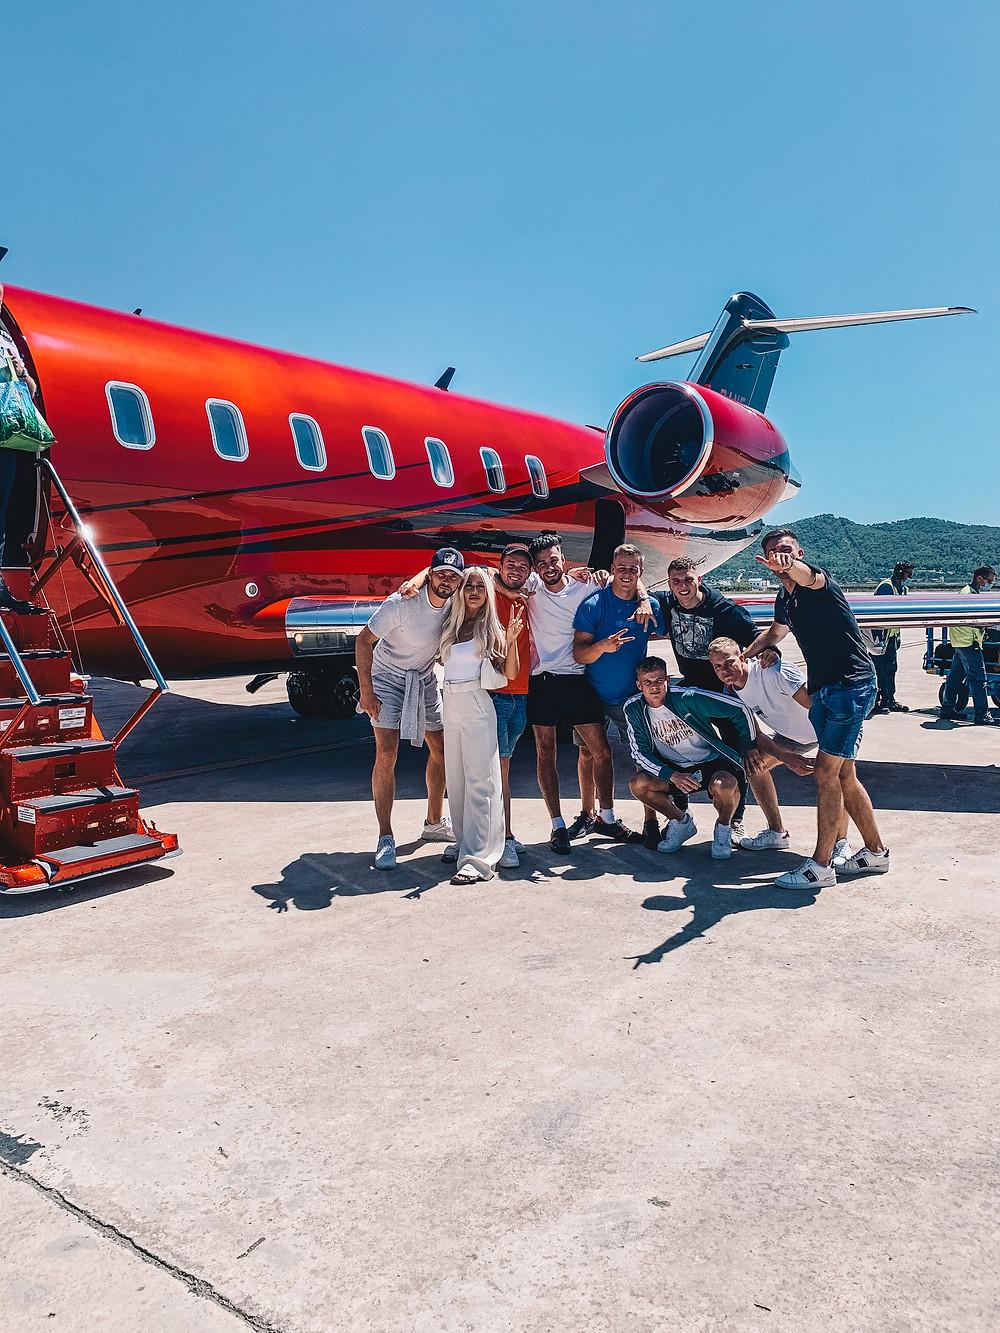 Dan Legg, Lewis Burton, Lottie Tomlinson, lewis Hamilton, private jet, ibiza